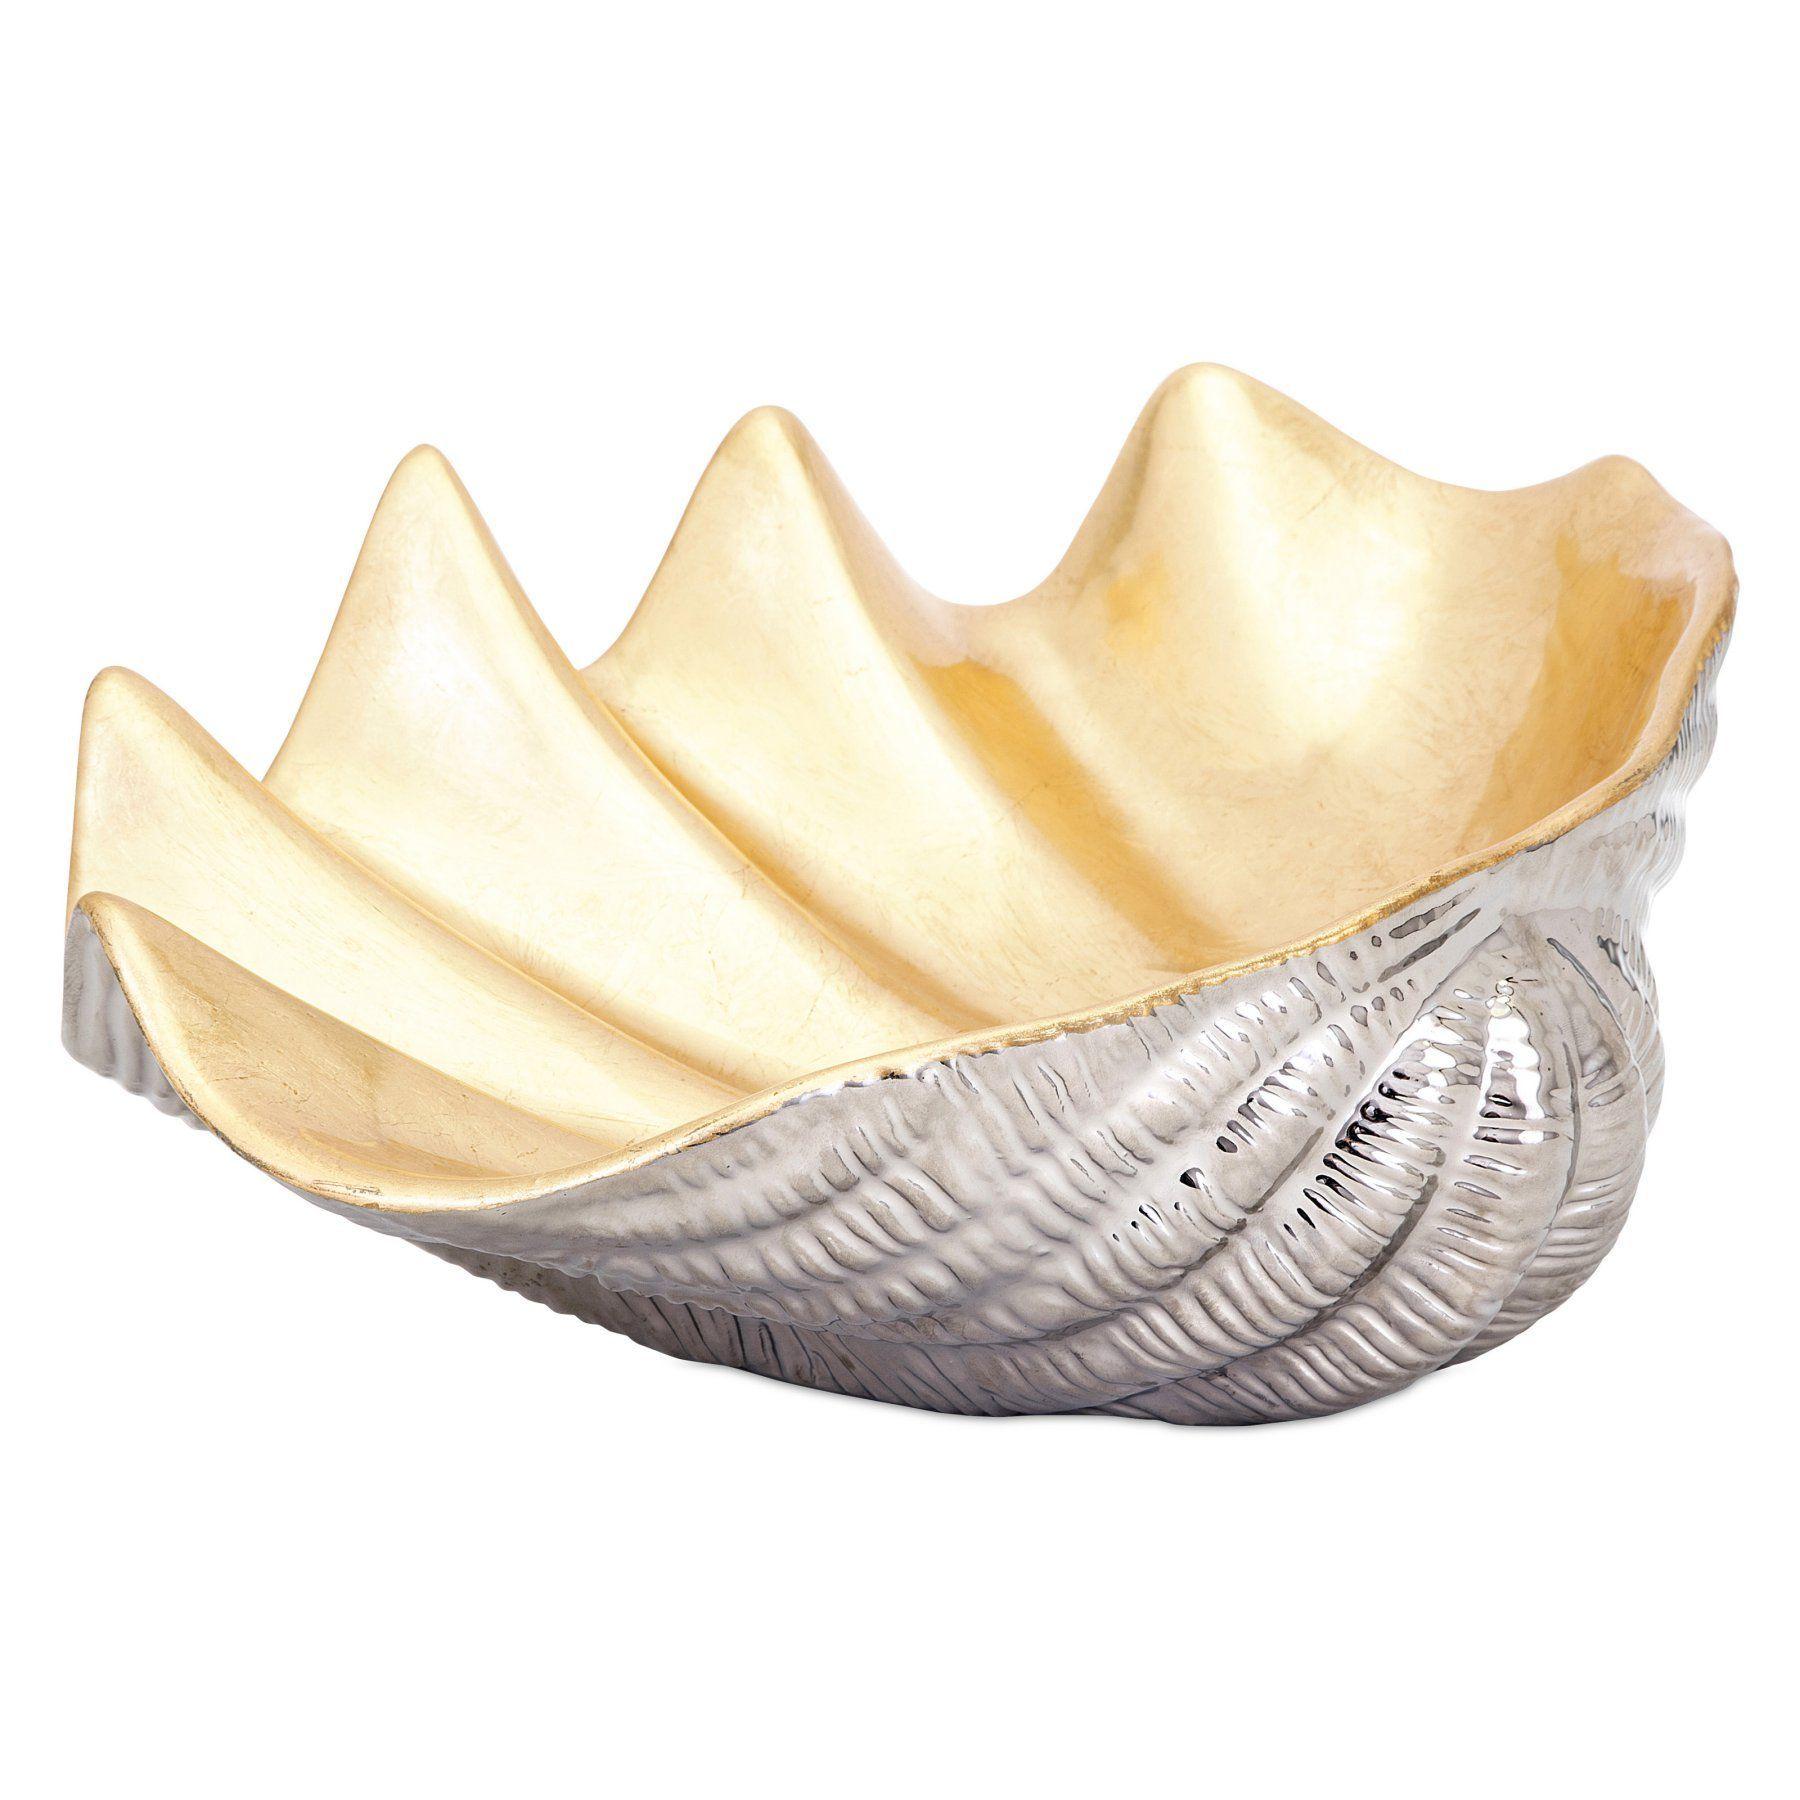 Yellow Decorative Bowl Imax Geneva Ceramic Shell Decorative Bowl 14446